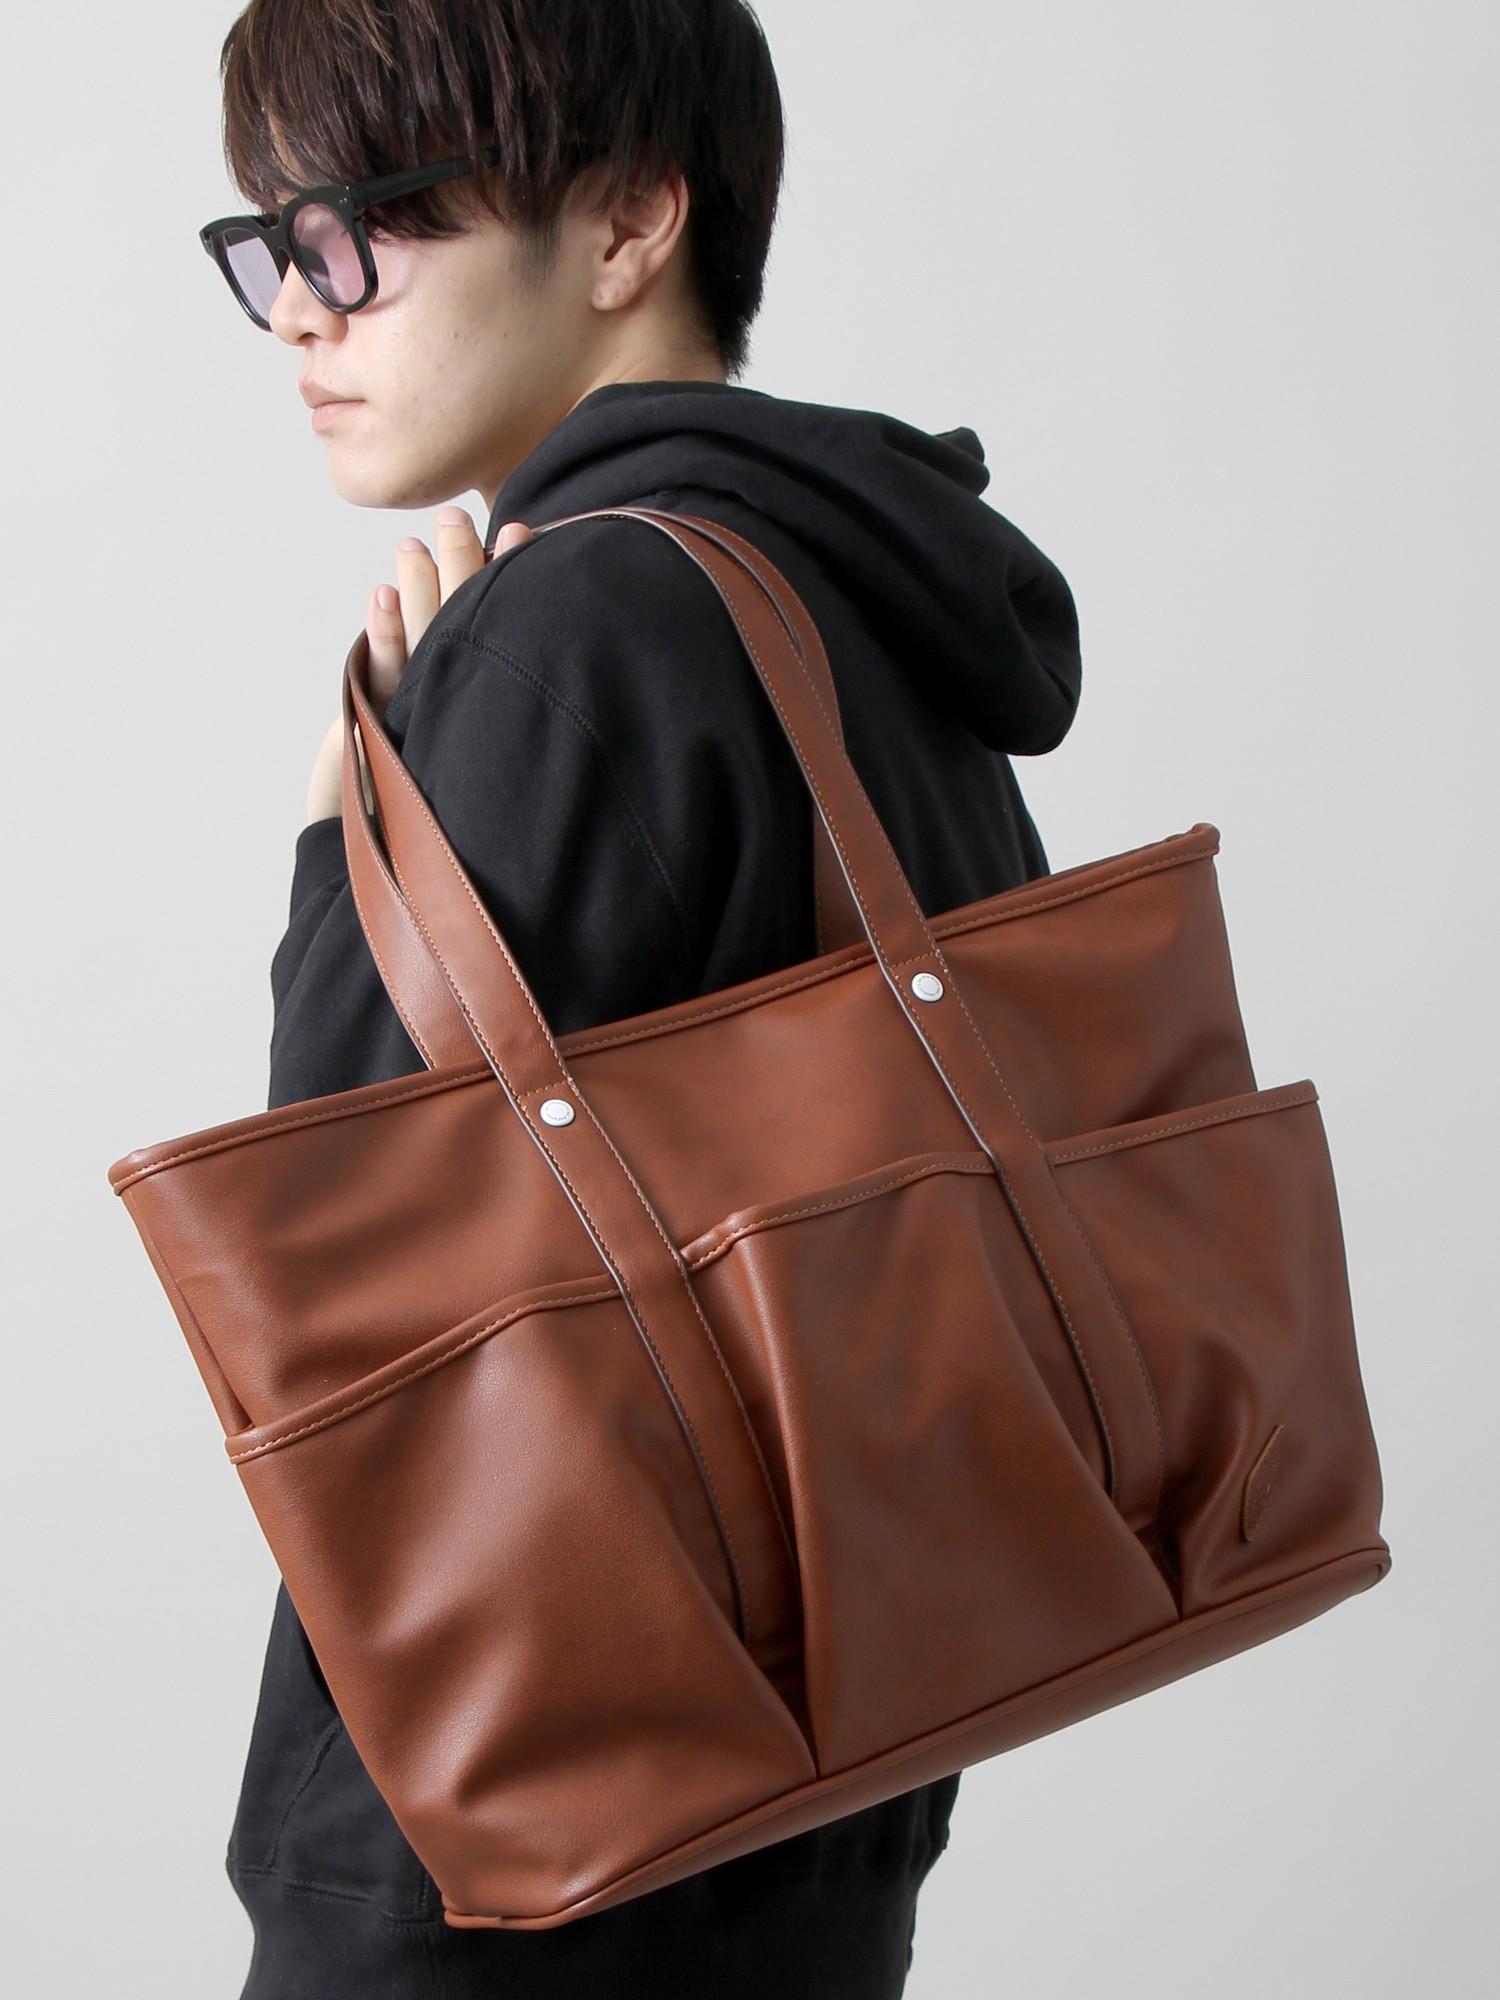 WEGO/フェイクレザー3ポケットトートバッグ